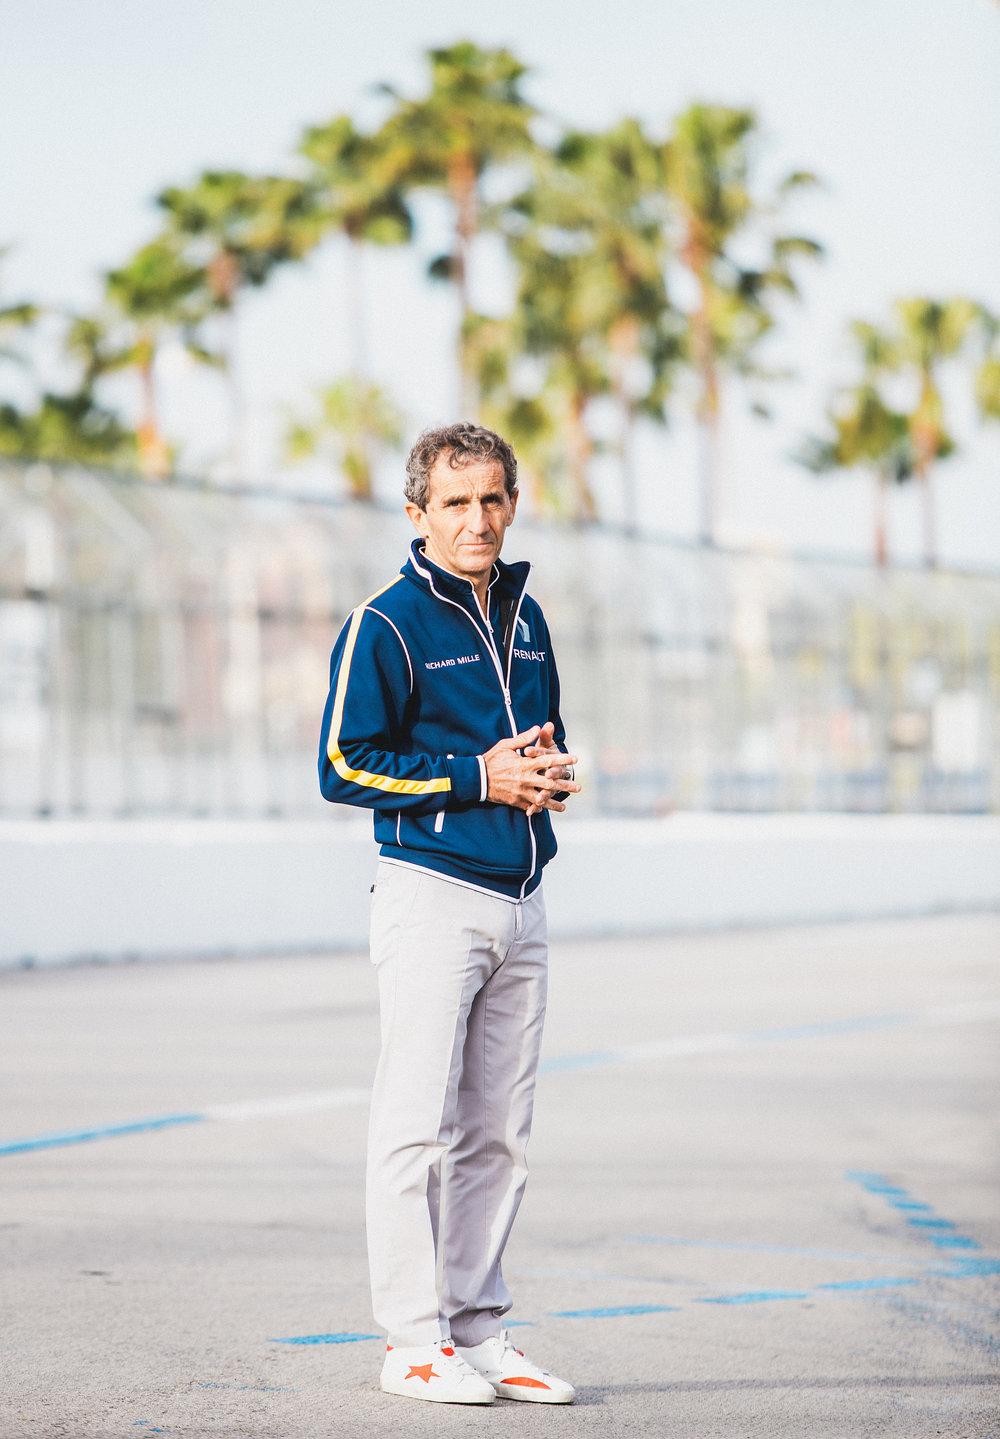 Alain Prost, eDams Renault 2015/16 FIA Formula E Championship, Long Beach, California, USA.